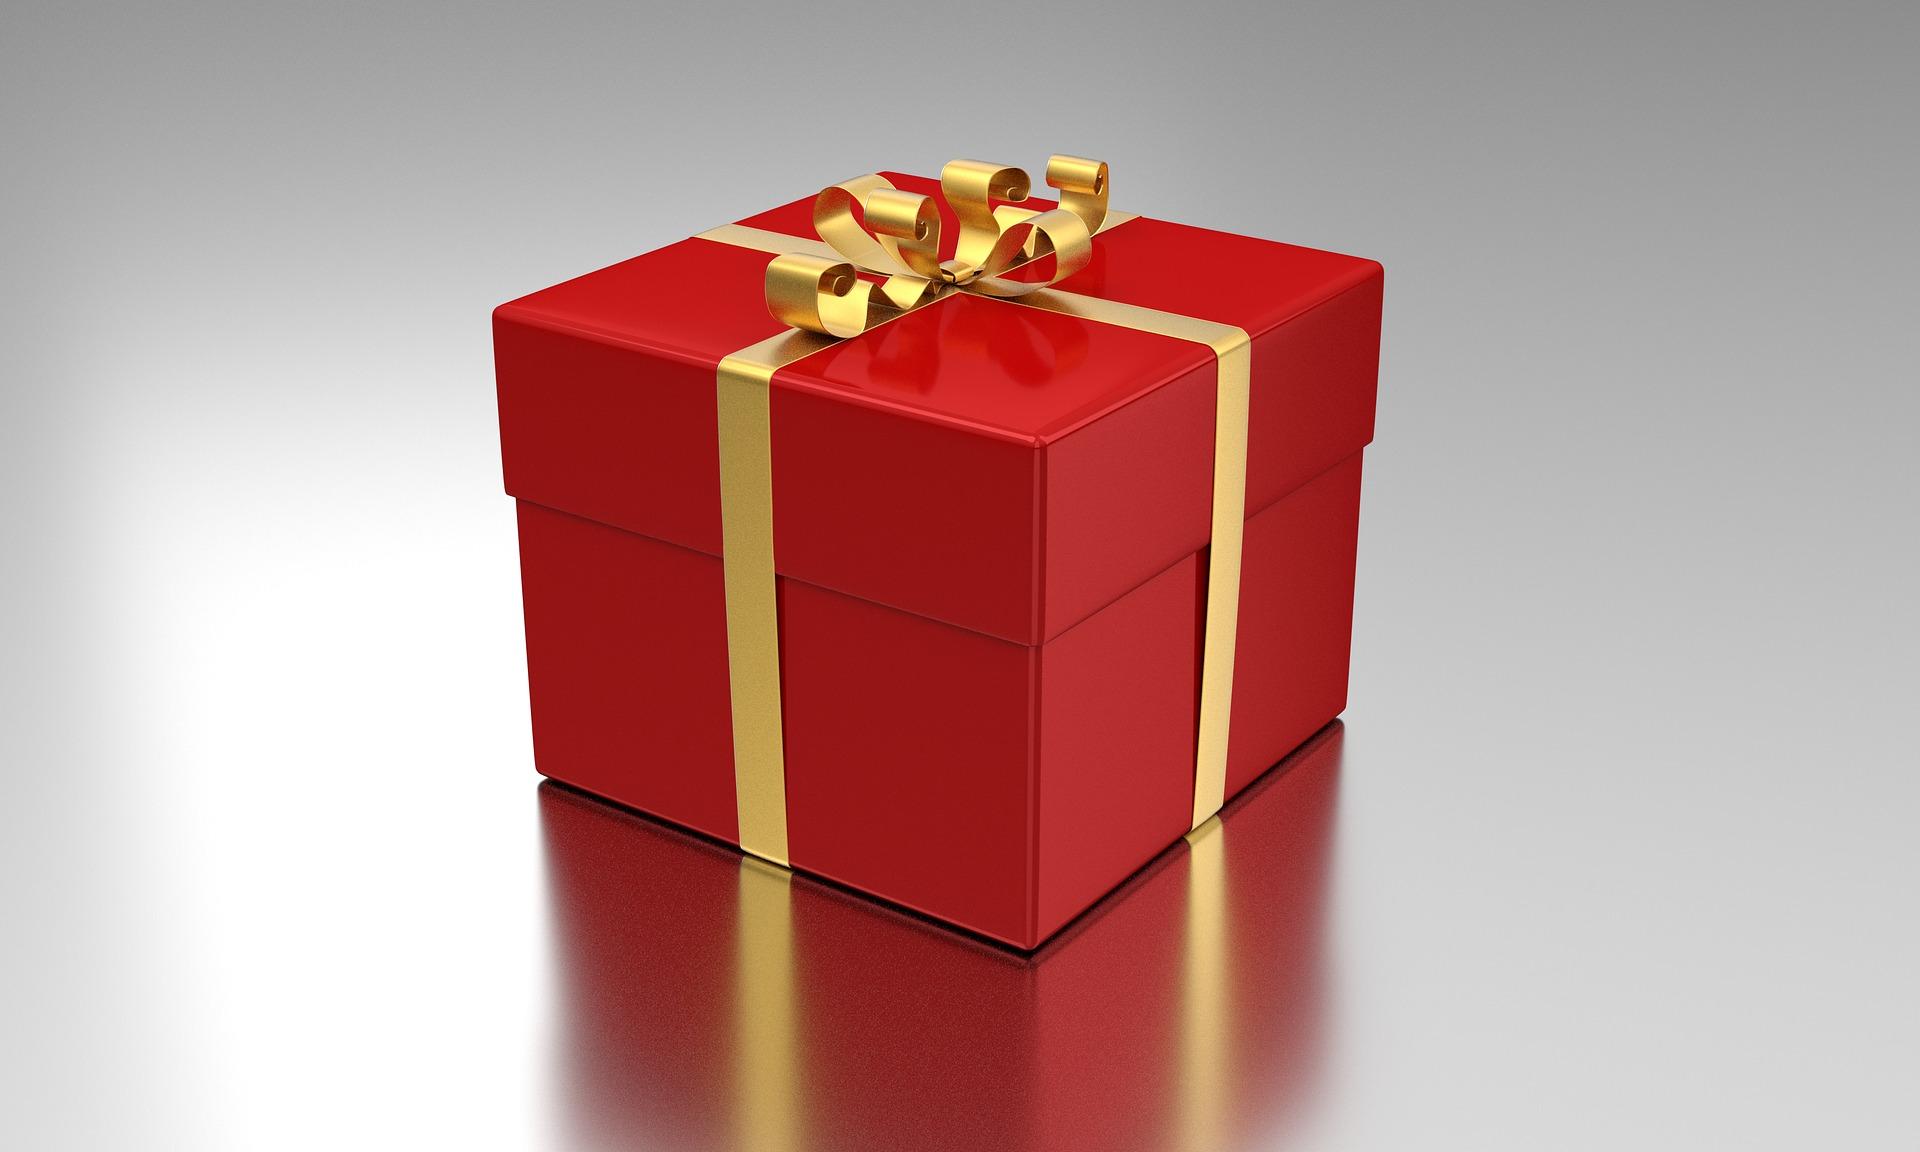 Best Websites to Buy Birthday Gifts Online